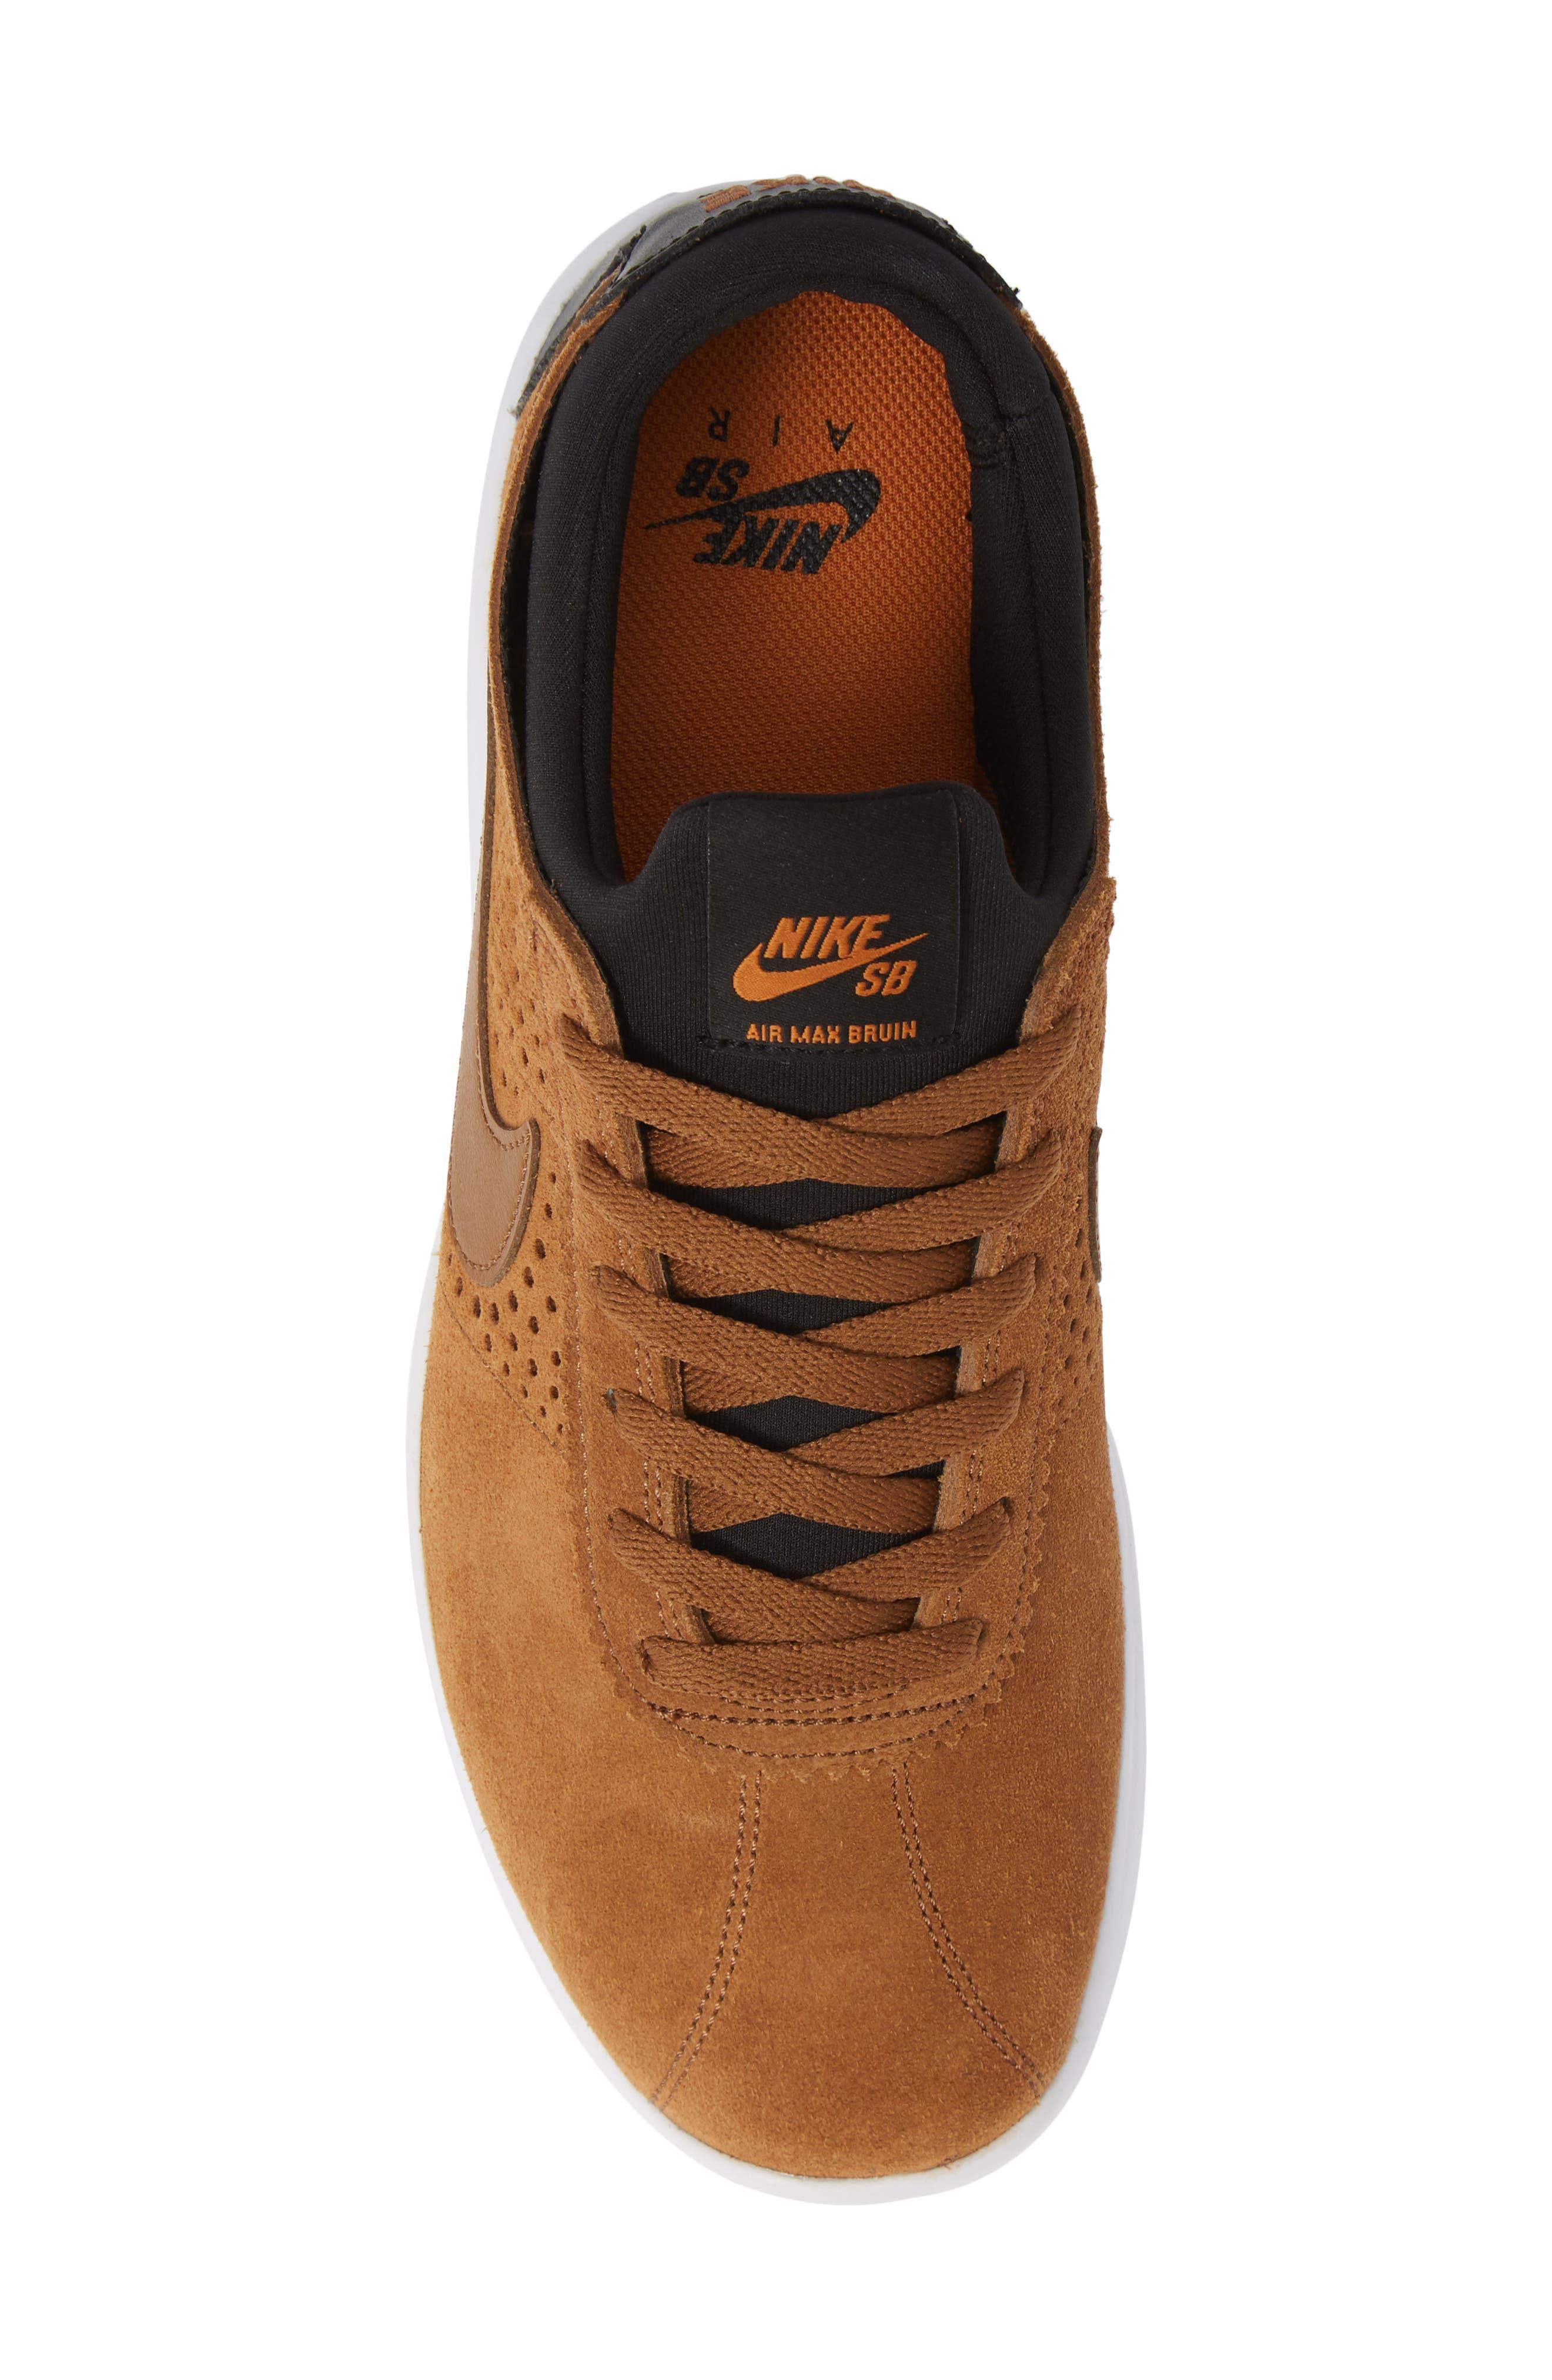 SB Air Max Bruin Vapor Skateboarding Sneaker,                             Alternate thumbnail 3, color,                             British Tan/ Black/ Monarch